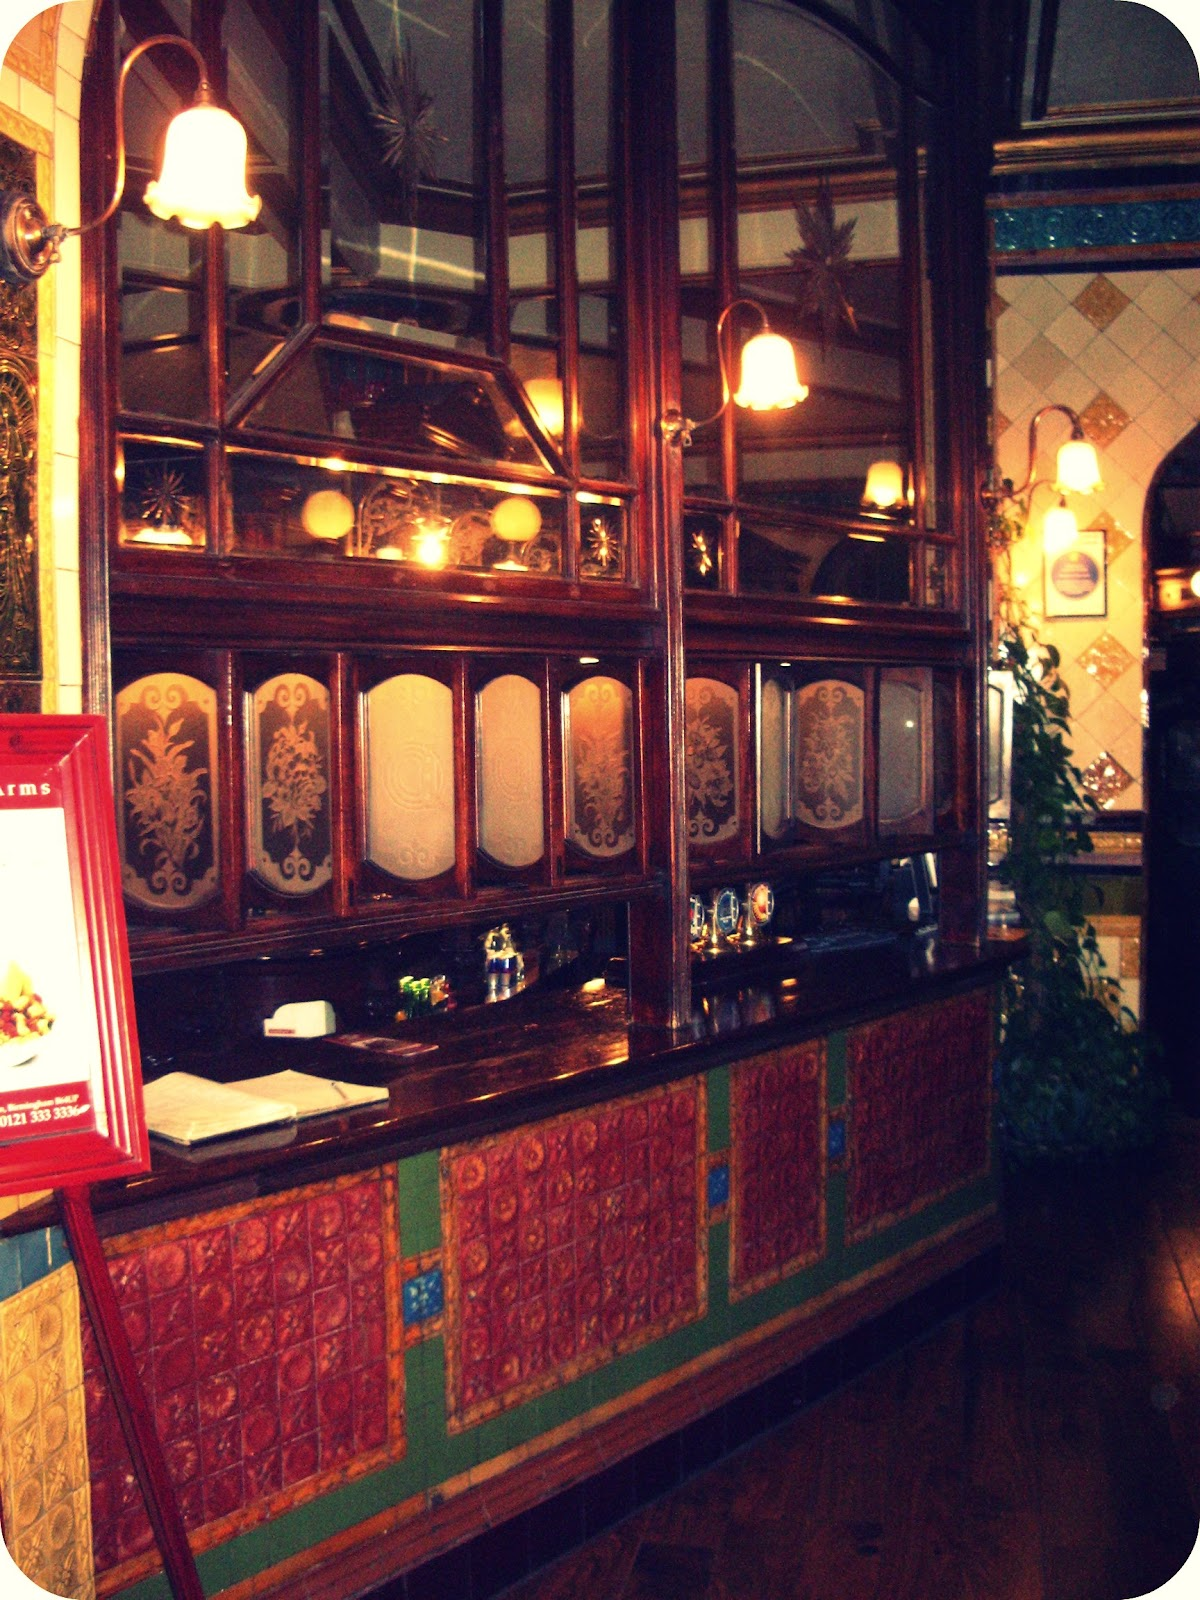 Spectacular Xmas Pub Restaurant Oxfordshire